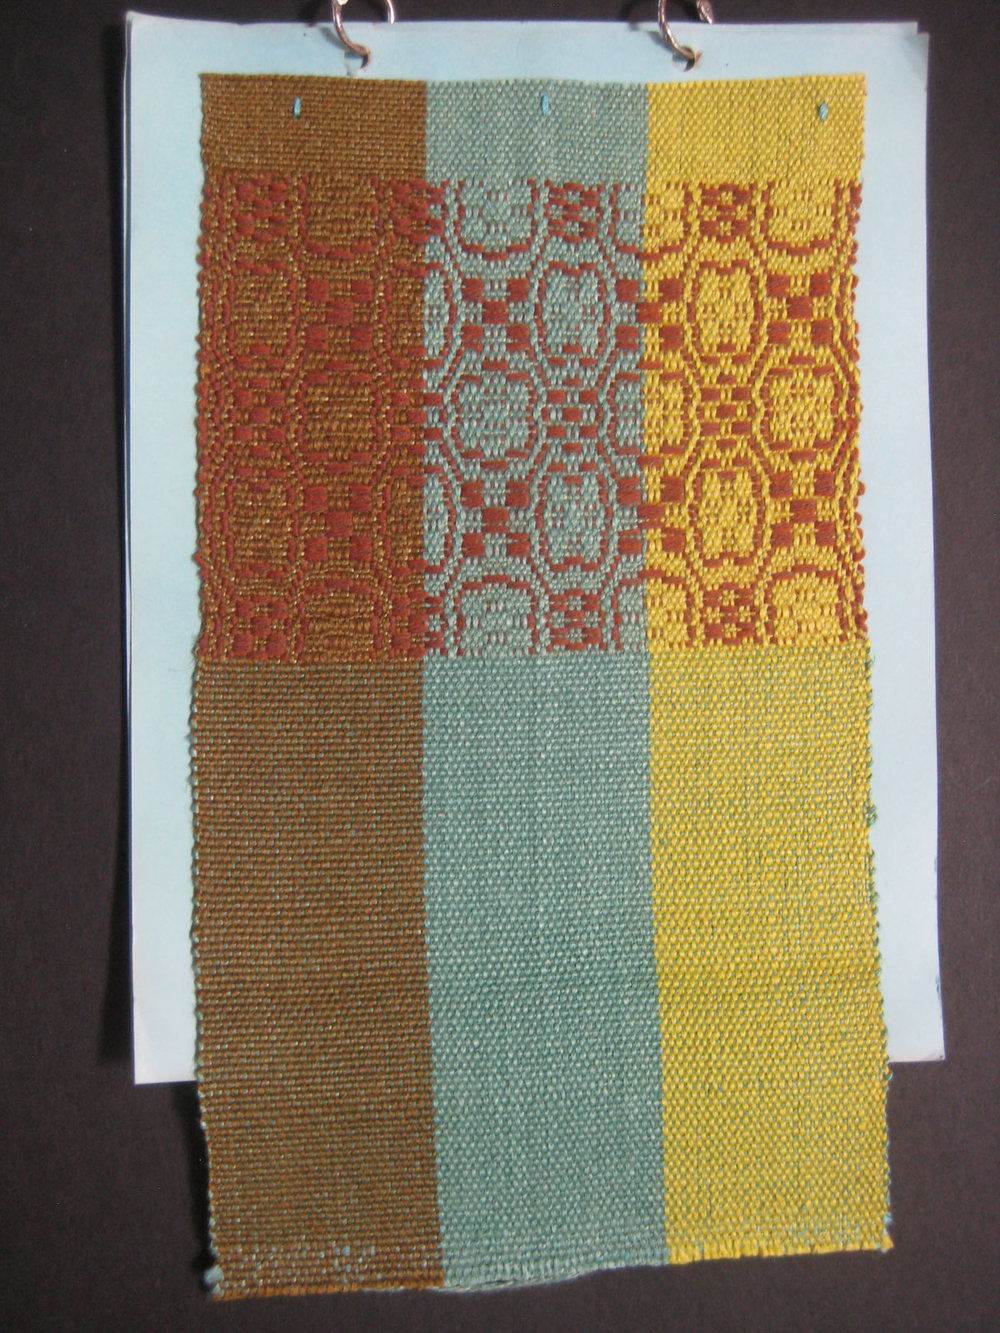 Warp Sett – 45 threads per 2 inches